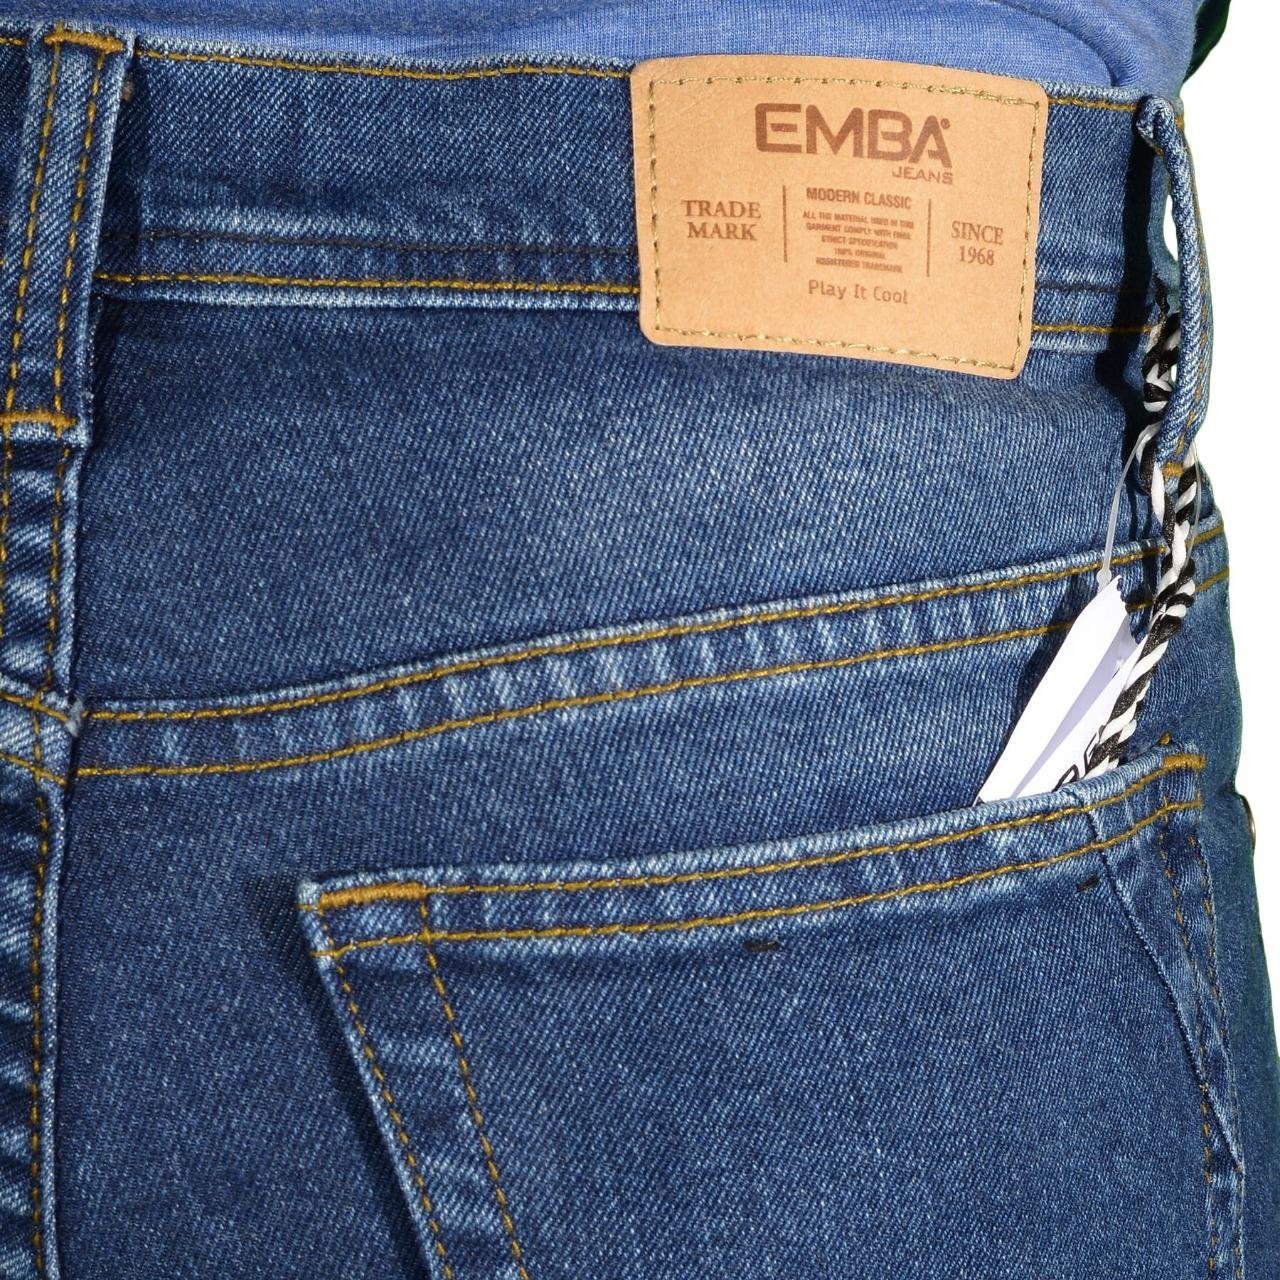 Emba Jeans Celana Panjang Pria Rodensi One 613 10138 20 Heavy Stone Classic Befarco Warna Storm Abu 31 Bs 071 Morgan Slim 617 11204